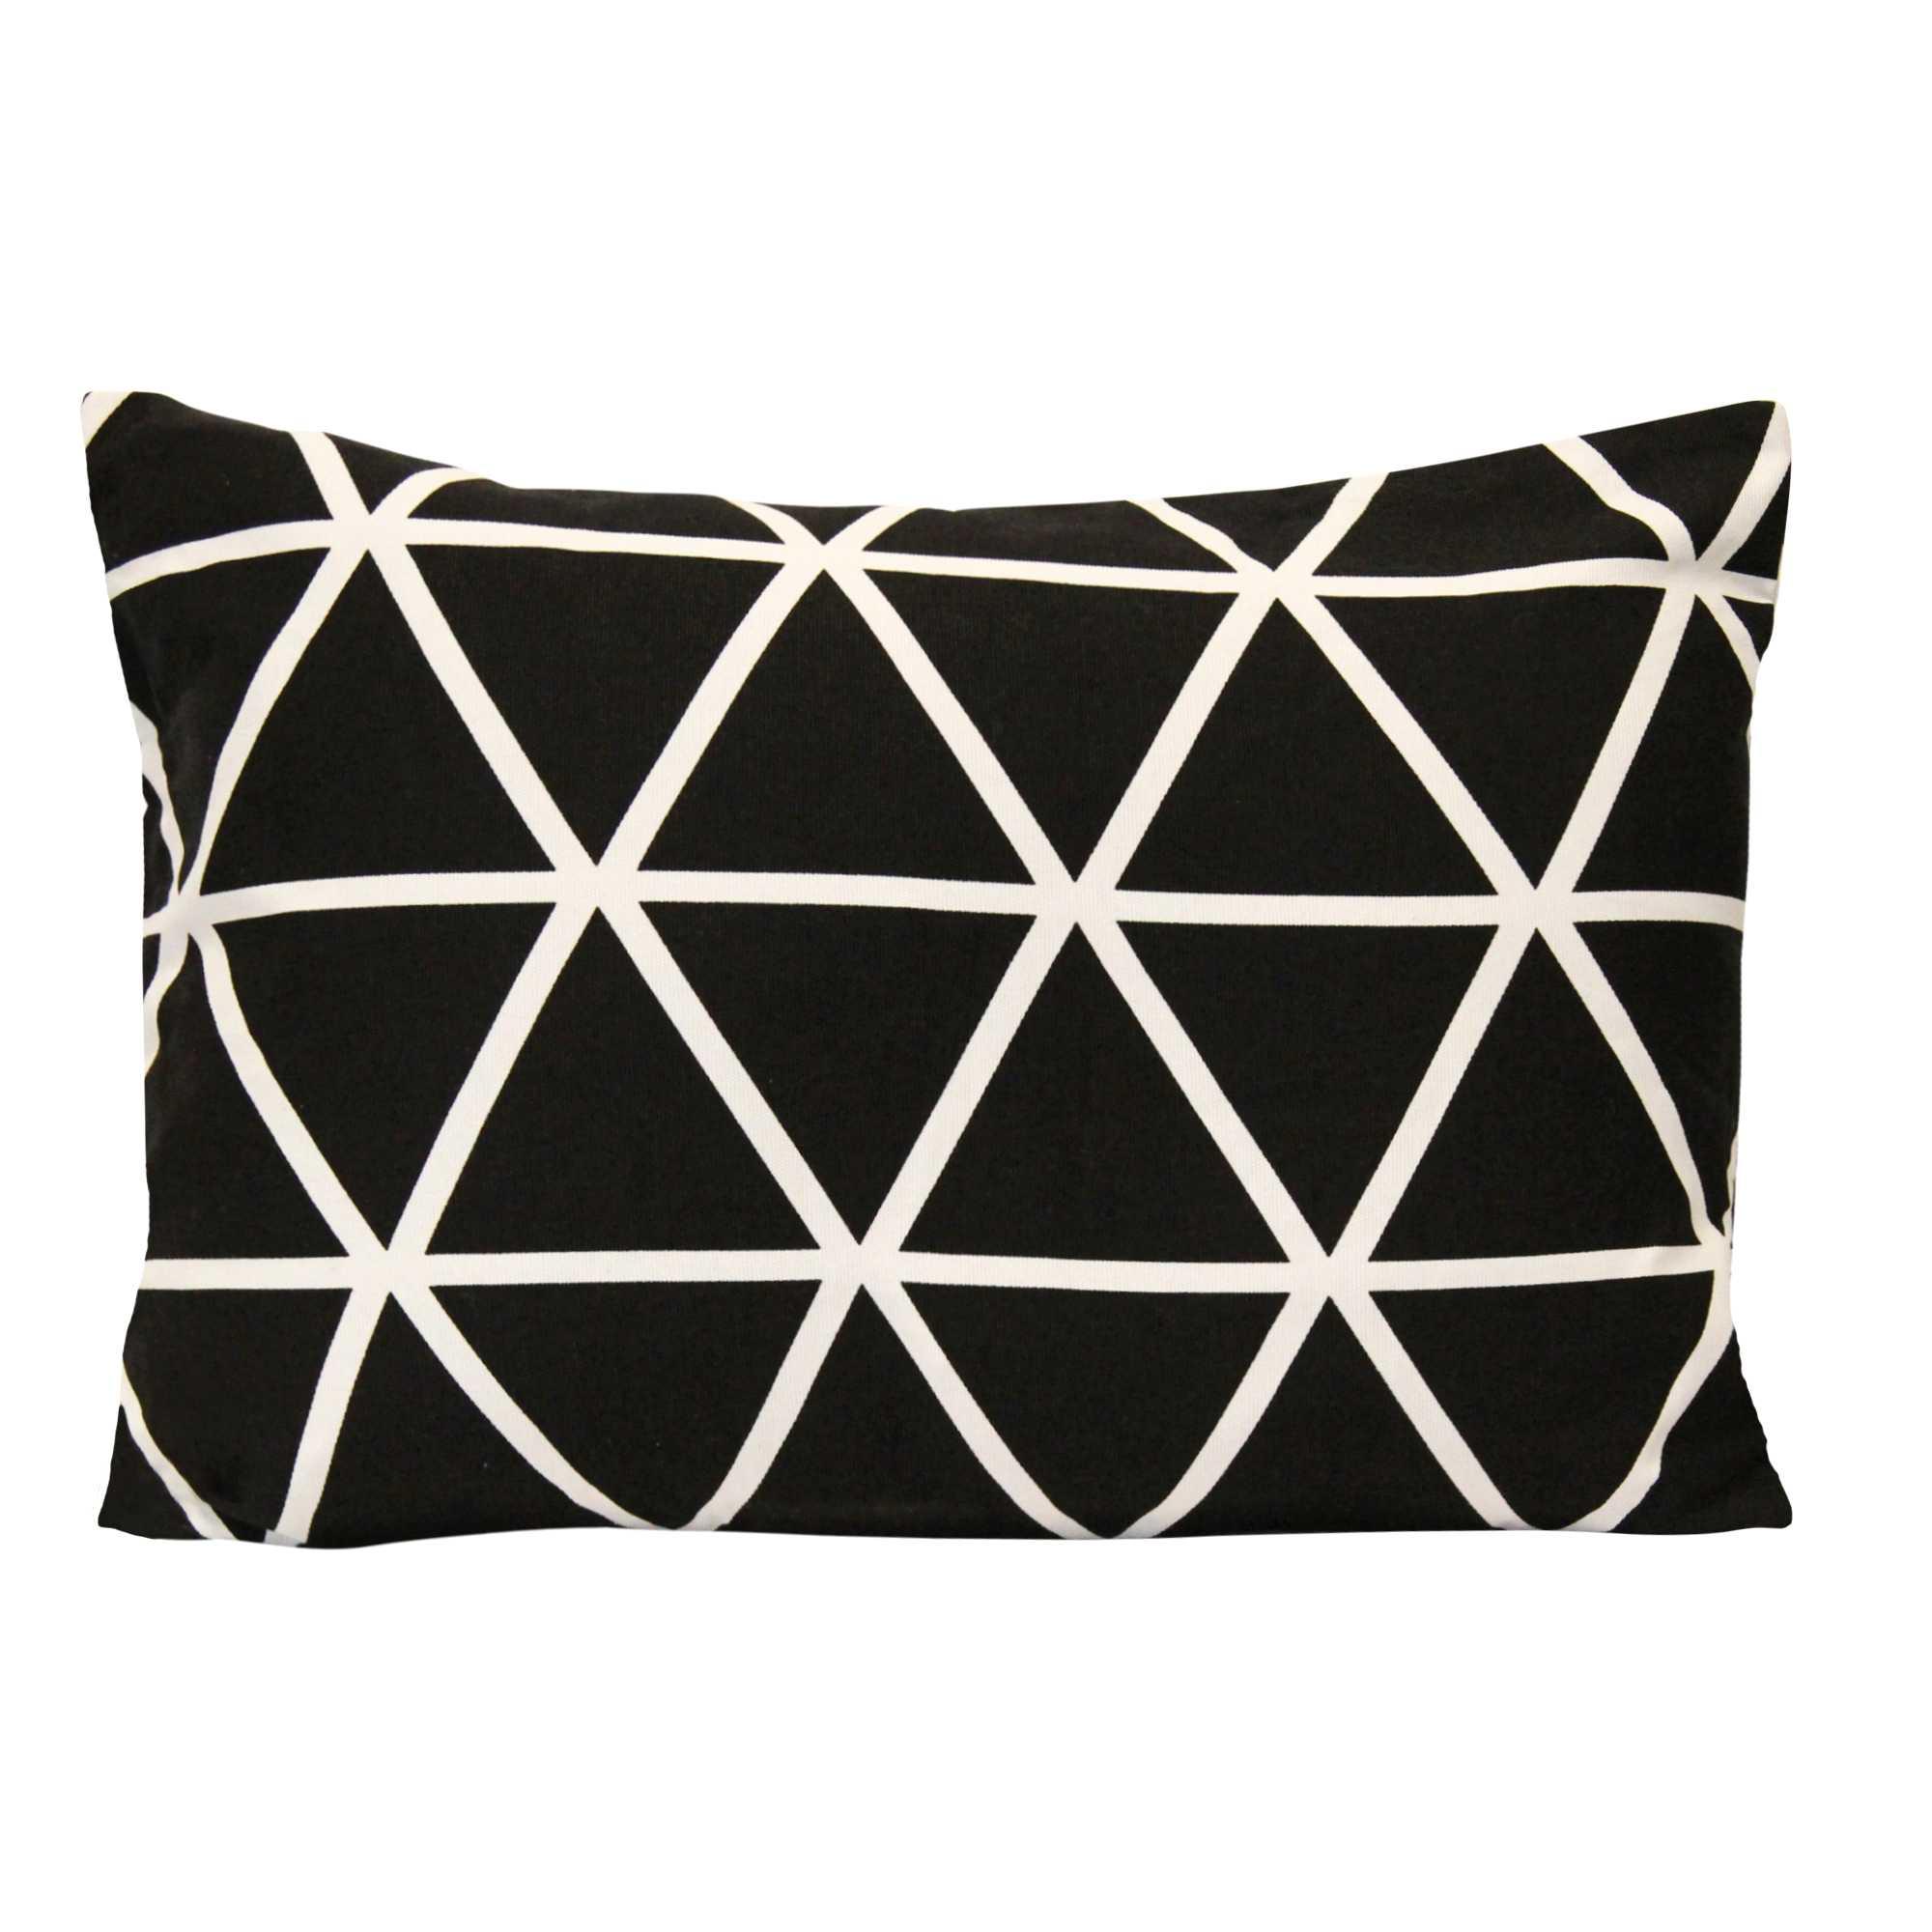 Black & White Geometric Design Lumbar Pillow